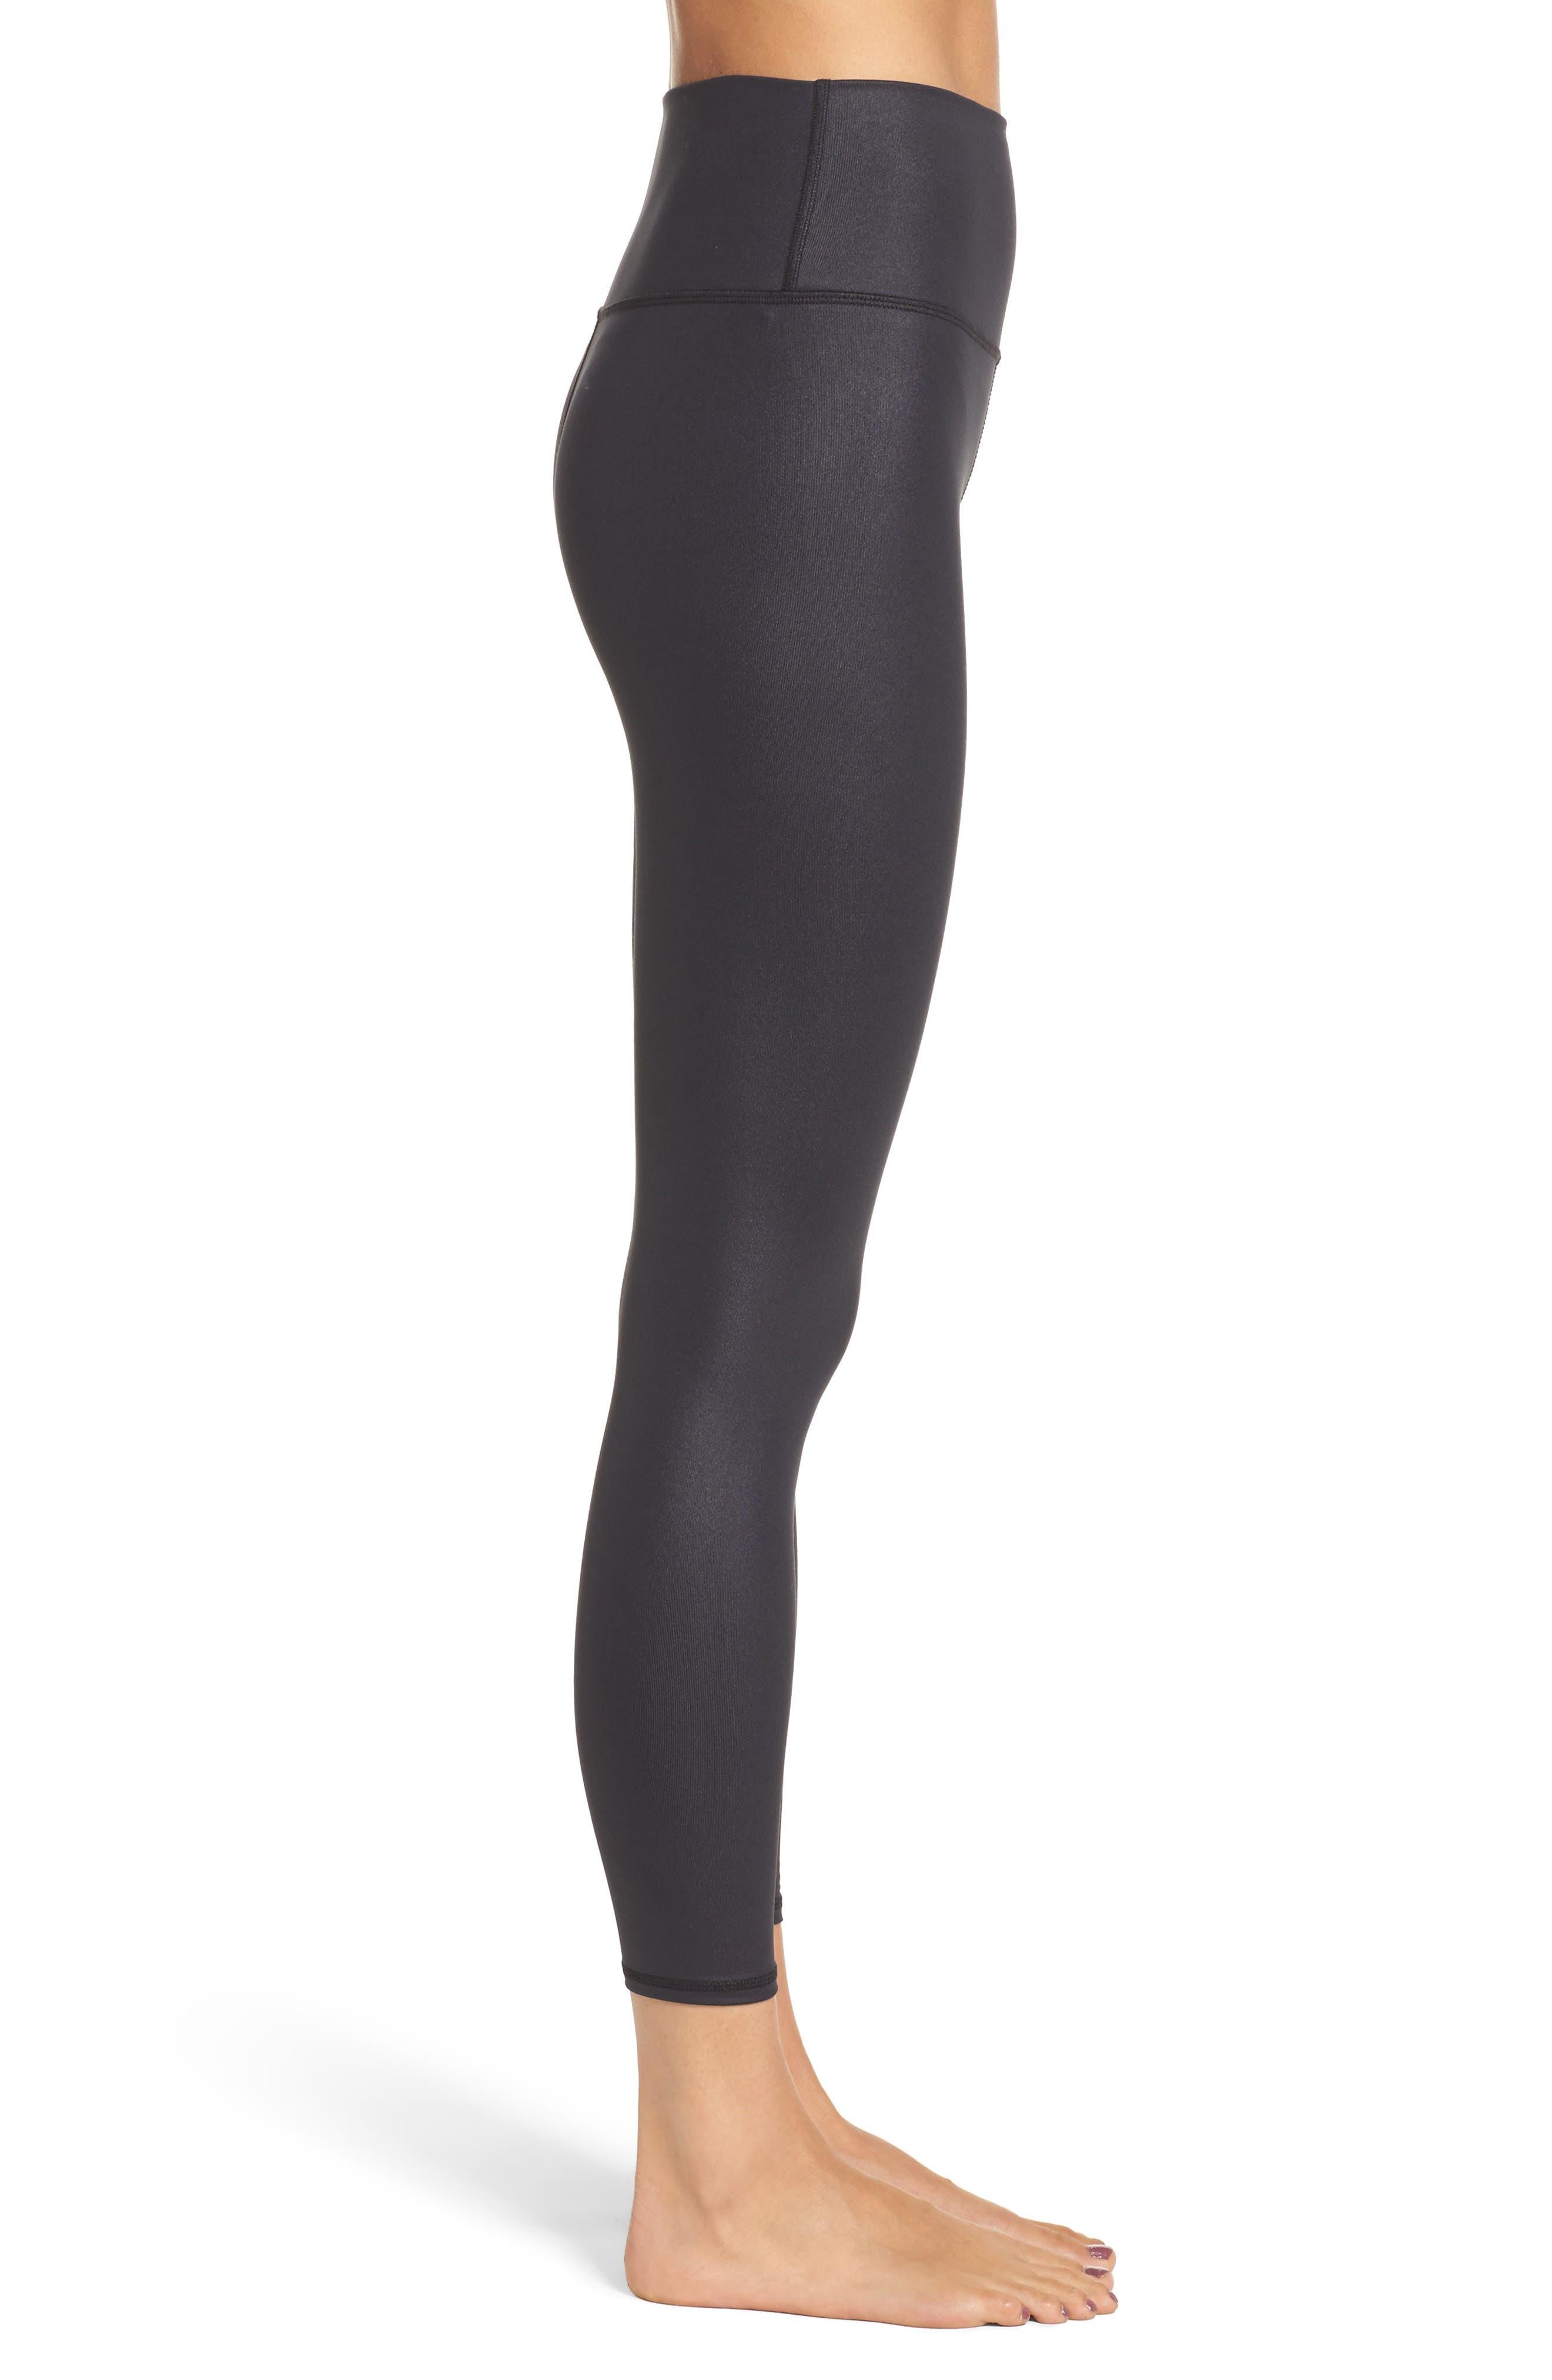 ALO, Airbrush 7/8 High Waist Leggings, Alternate thumbnail 4, color, BLACK GLOSSY